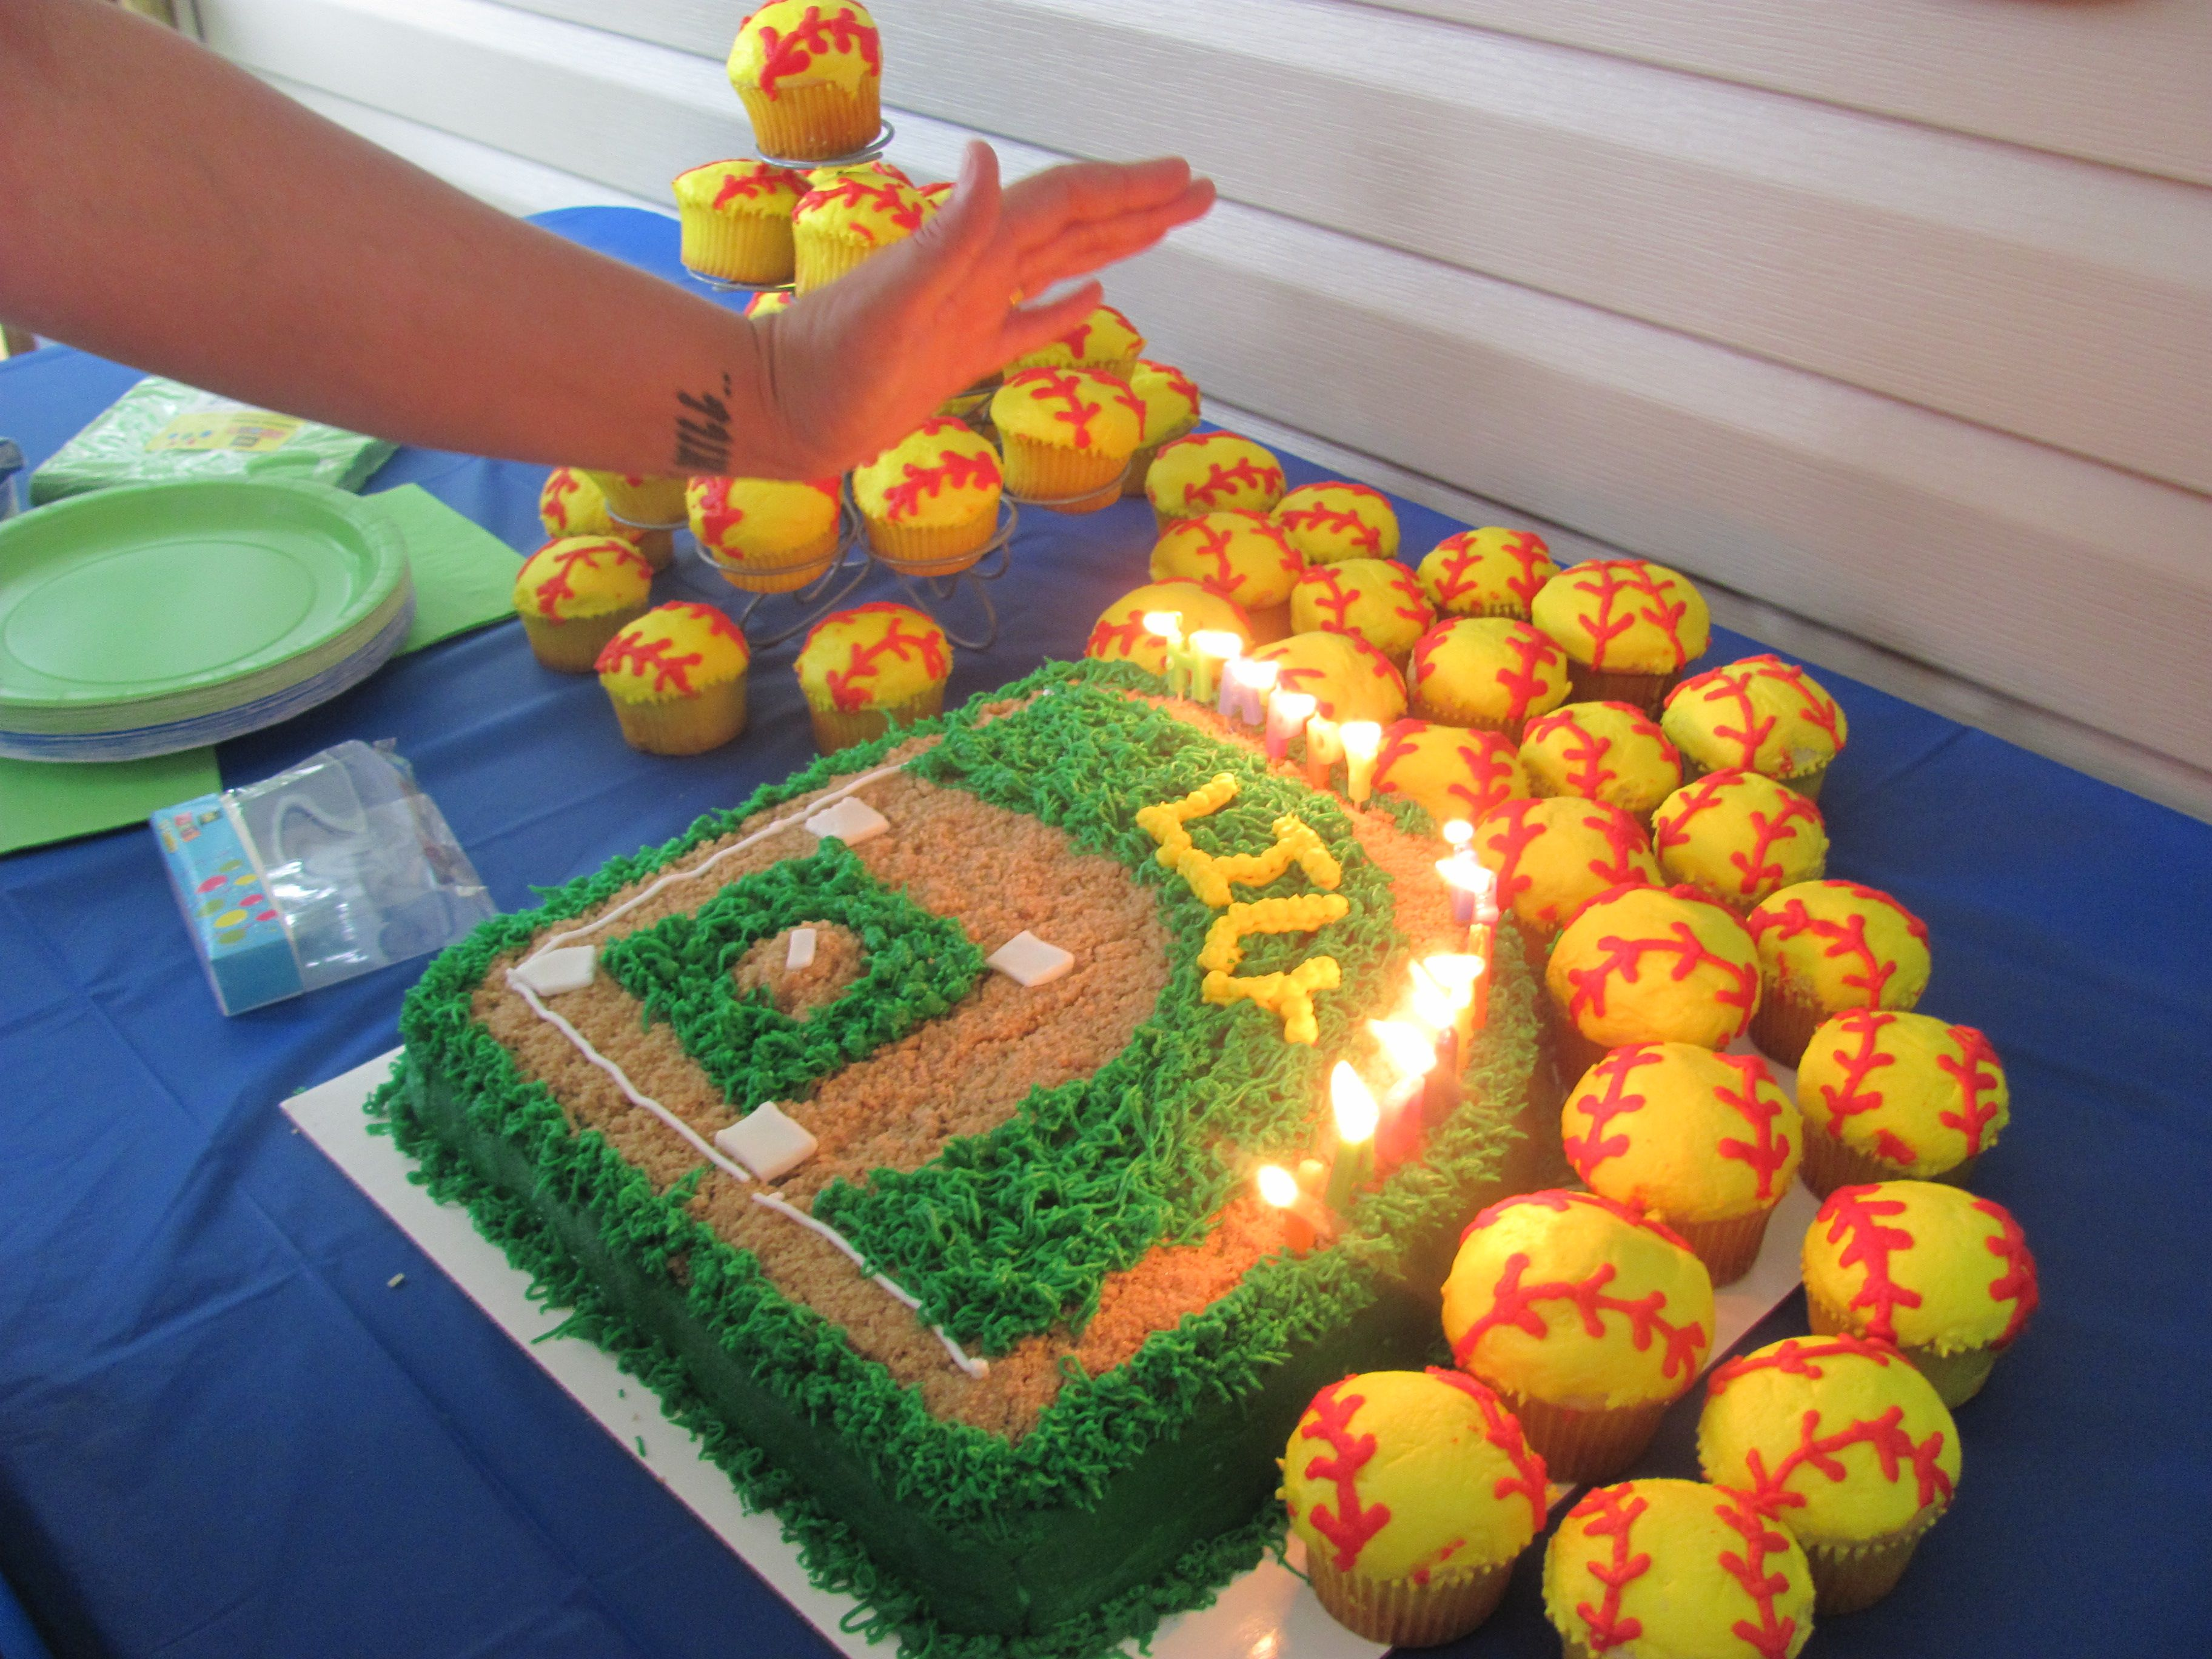 Softball Cake Decorating Ideas 13622 Softball Cake Decorat